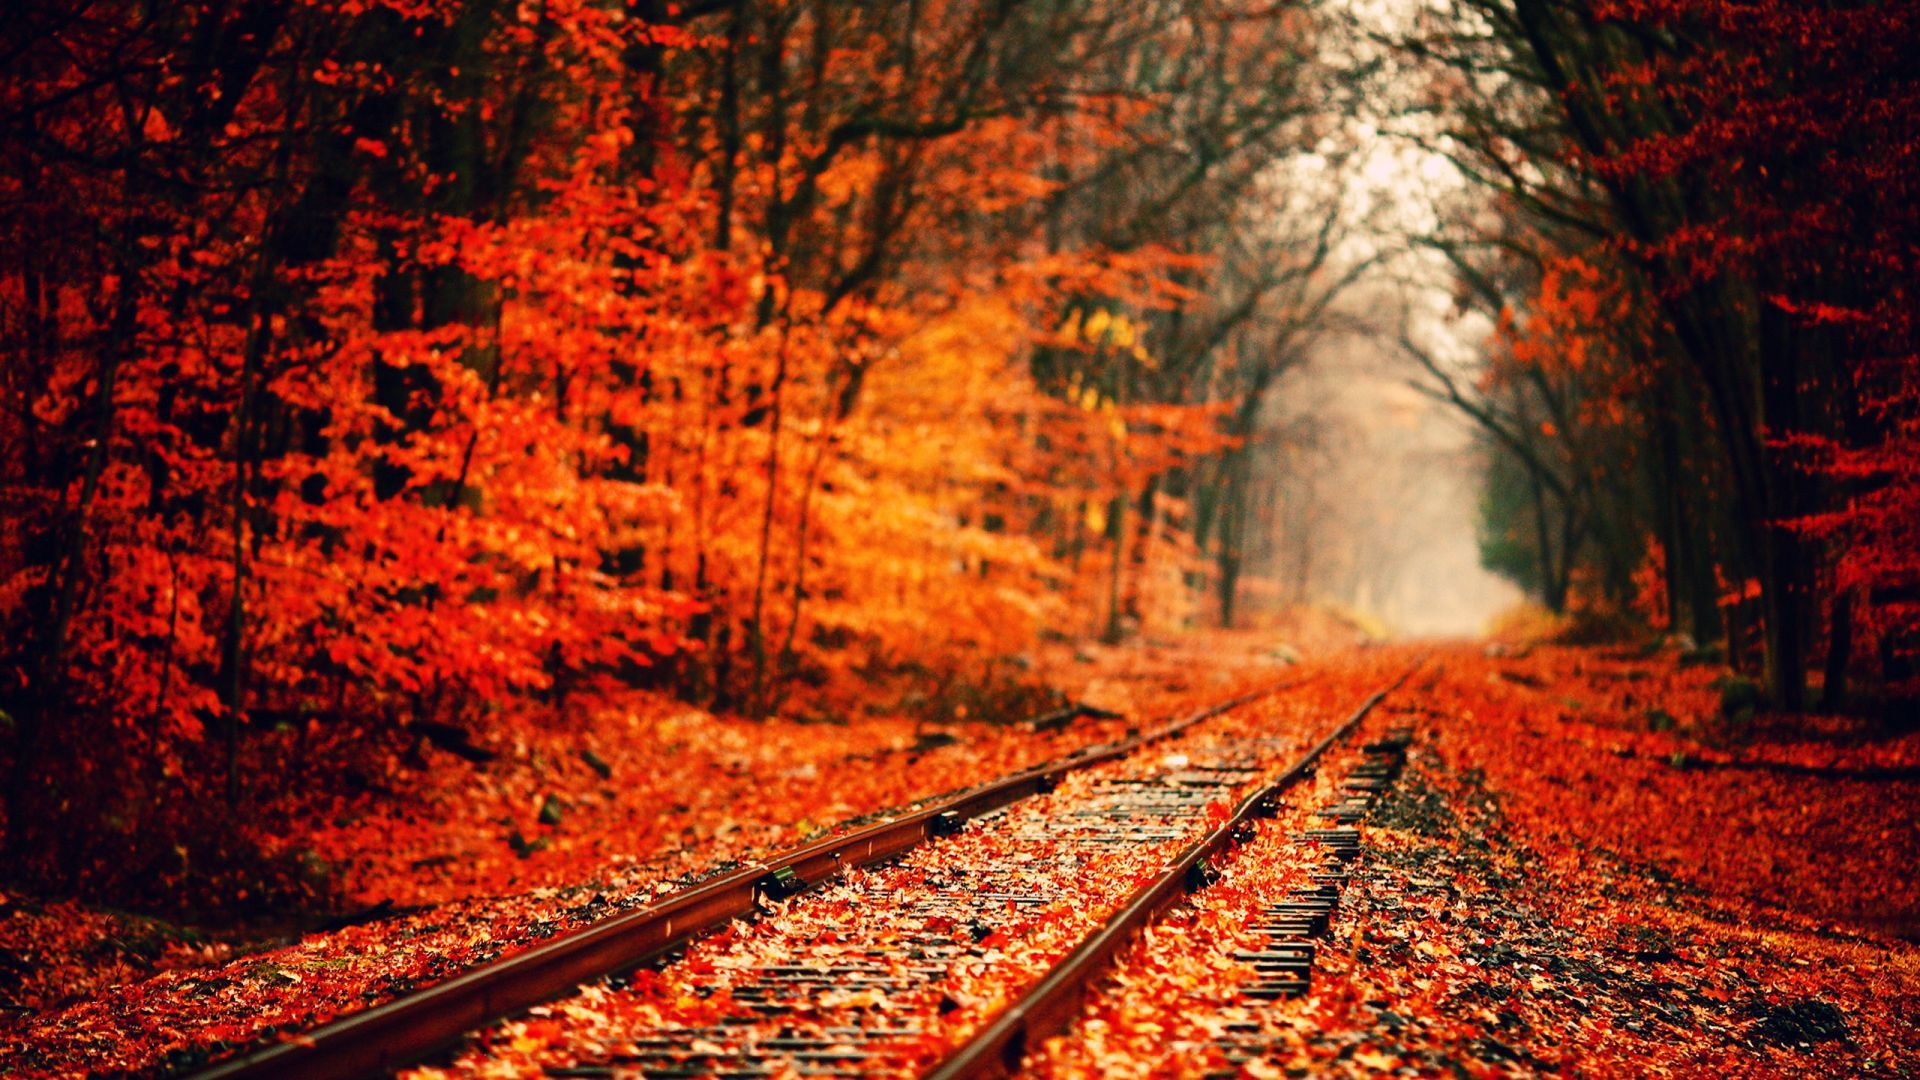 autumn tumblr wallpaper background #ypz 1920x1080 px 414.47 kb